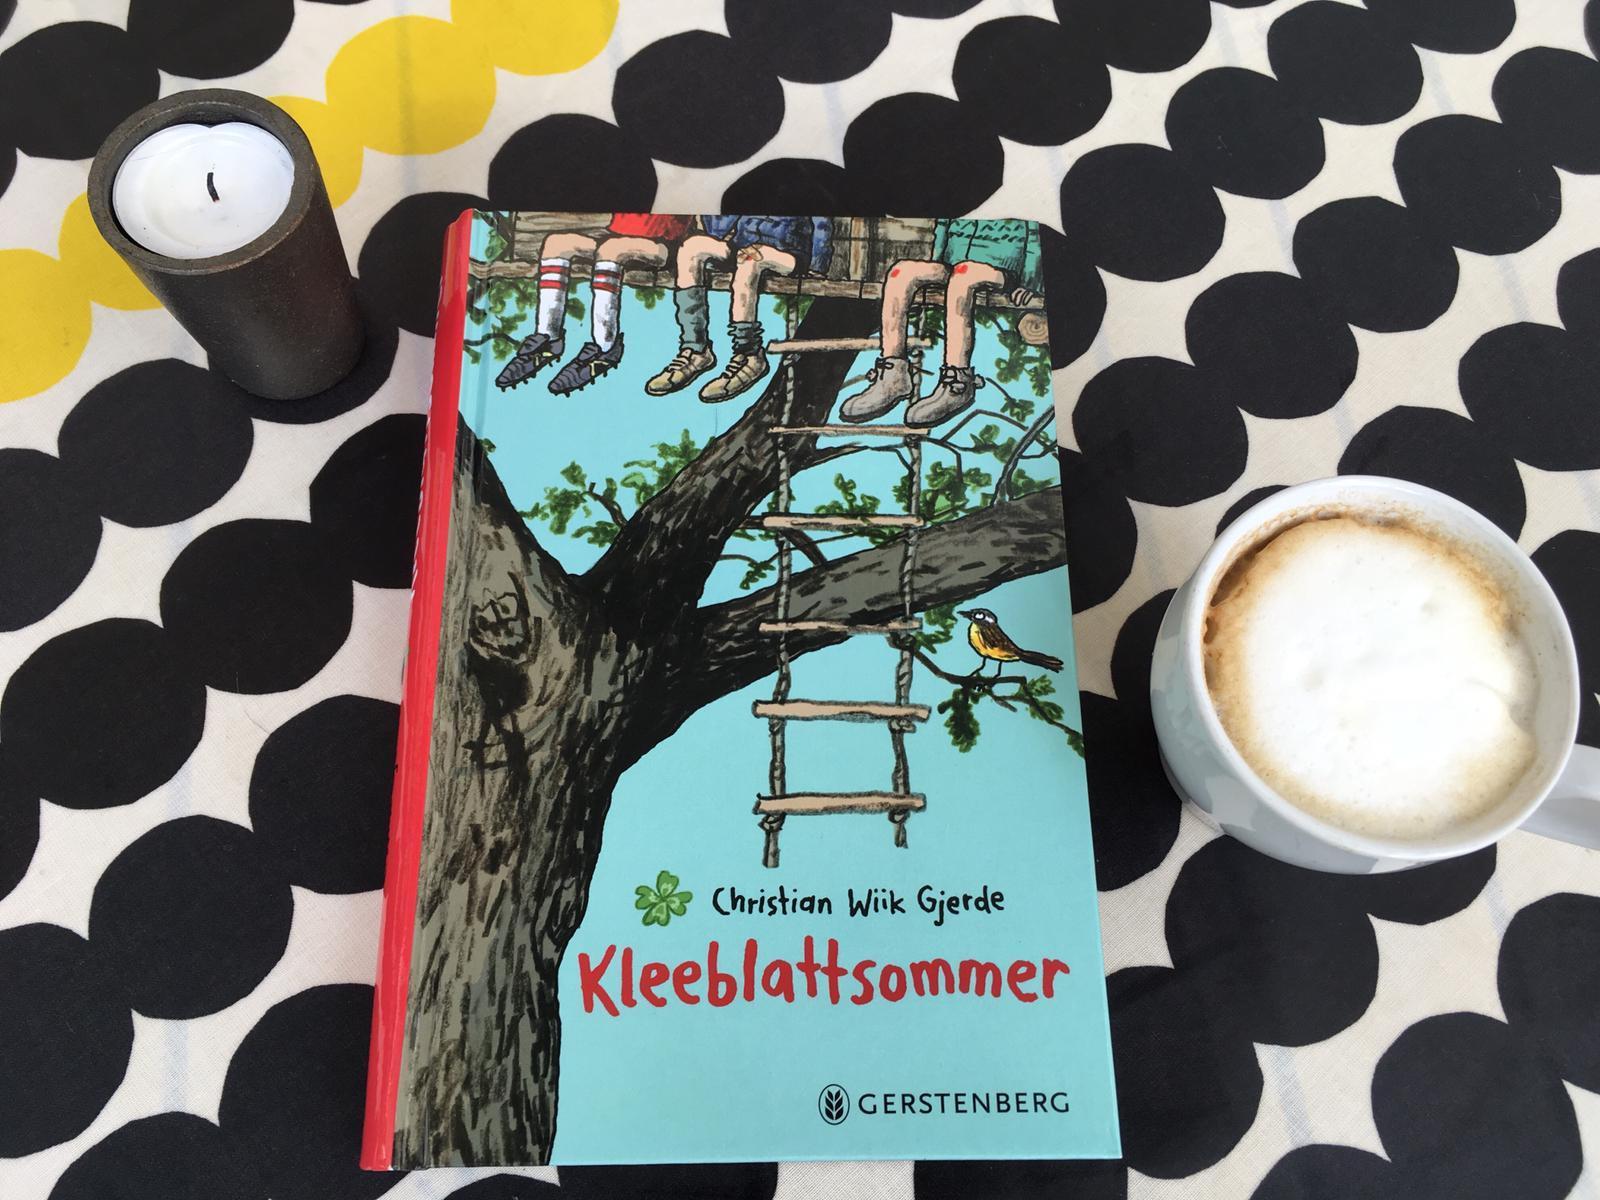 Christian Wiik Gjerde Kleeblattsommer Foto: Besser Nord als nie!